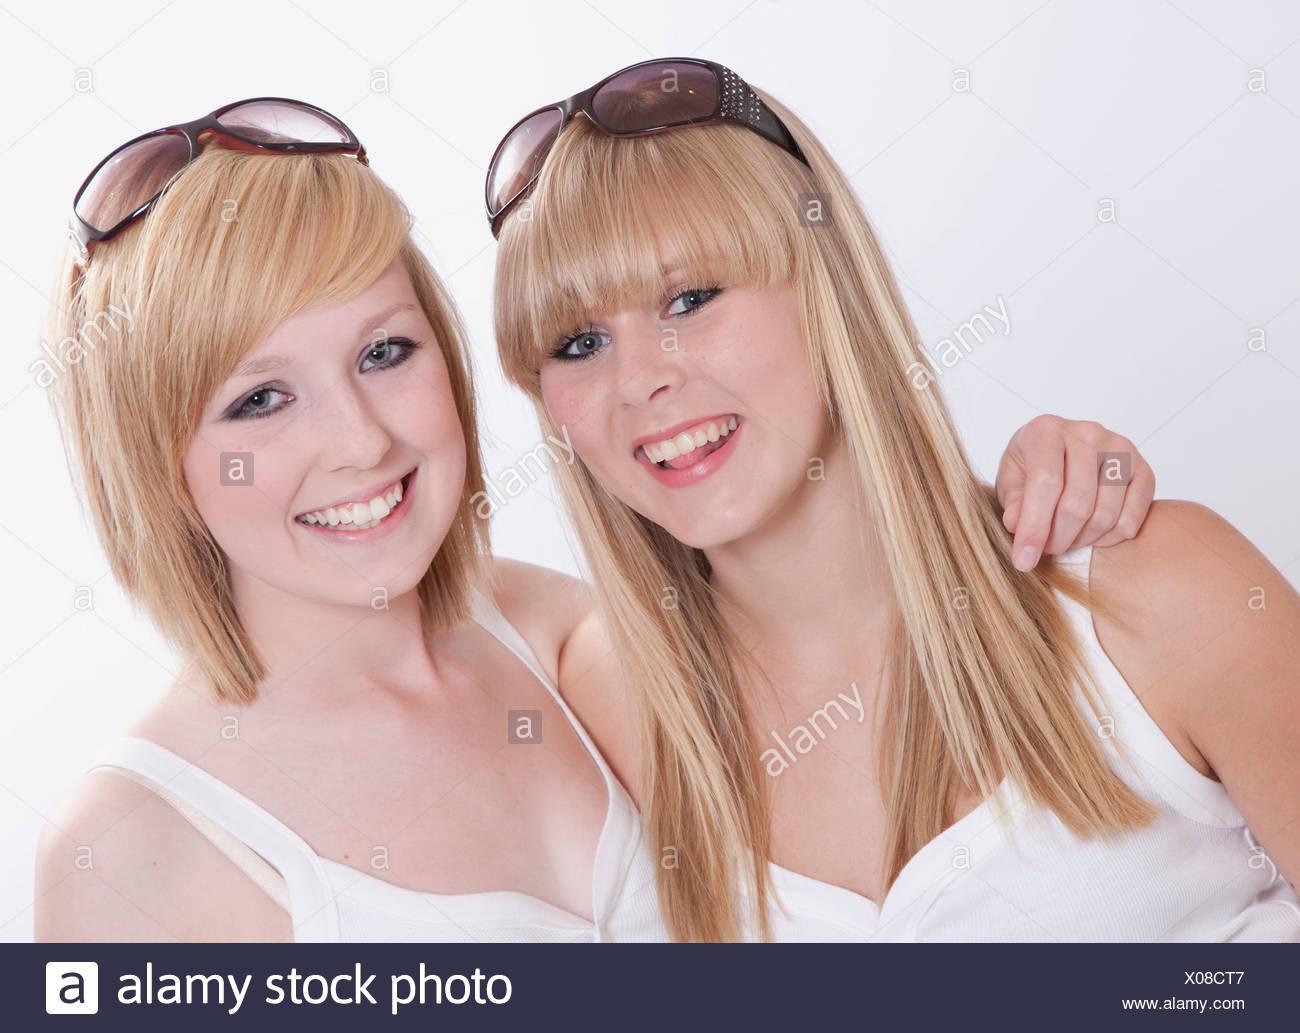 Korey recommend best of on cam girls 2 teen